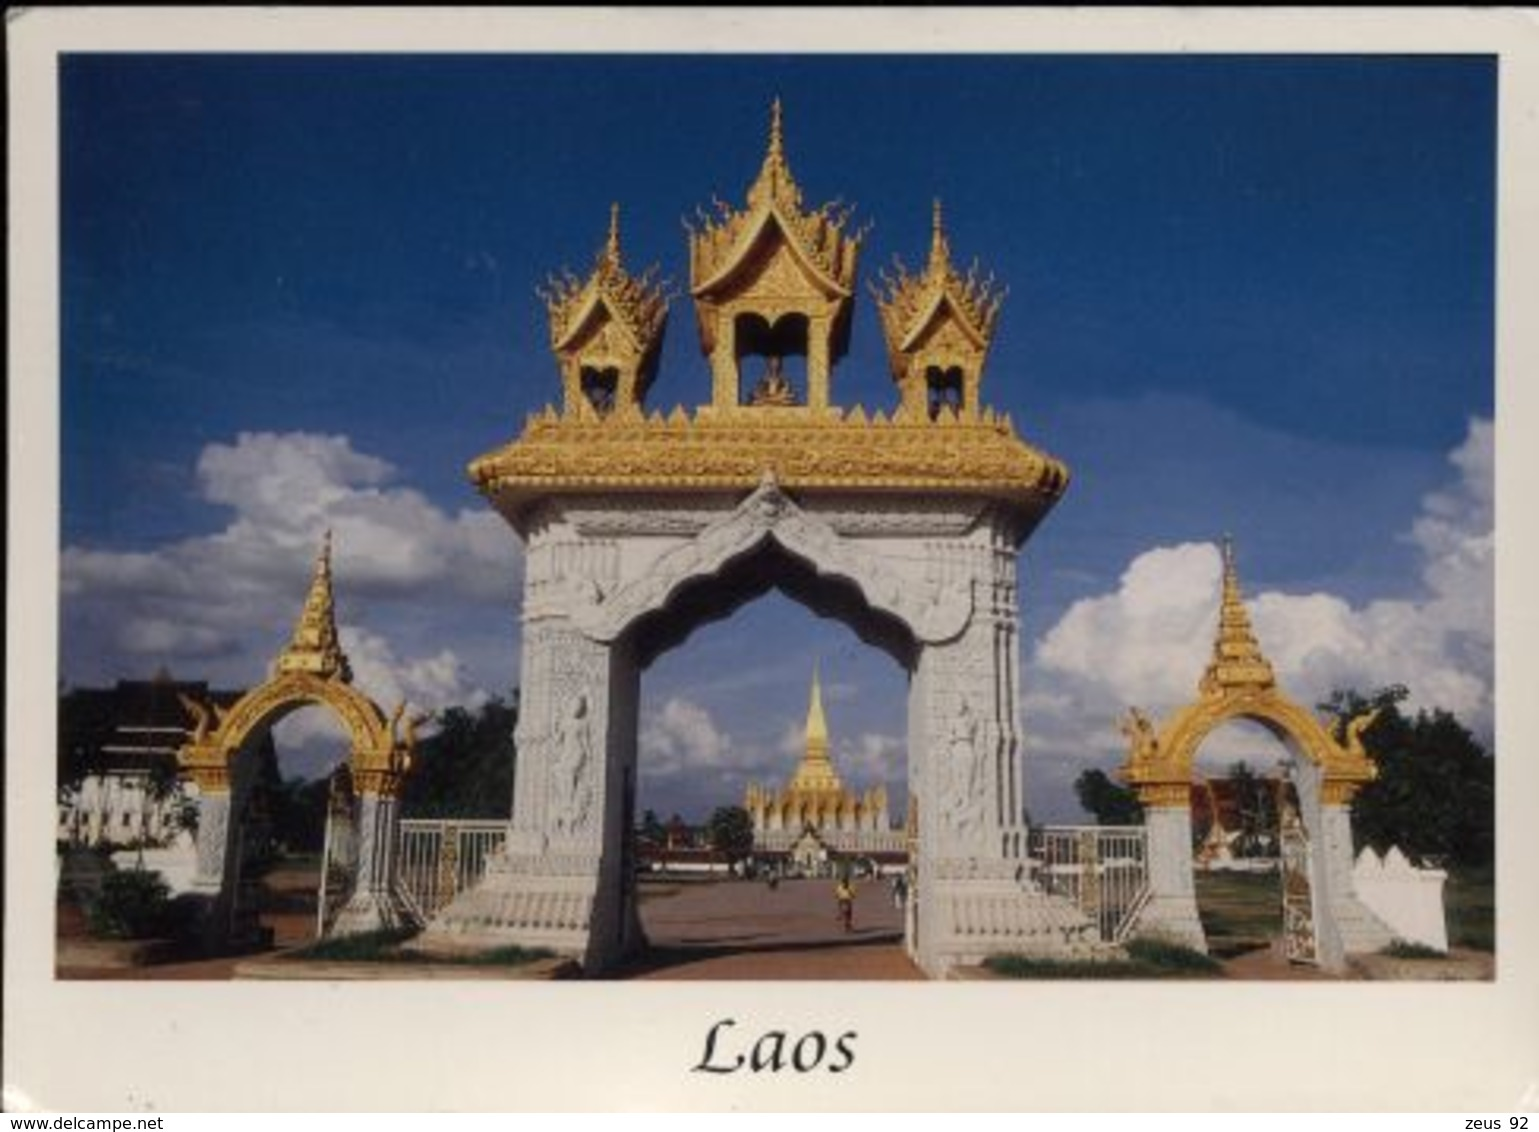 C575 LAOS - VAT THAT LUANG - Laos